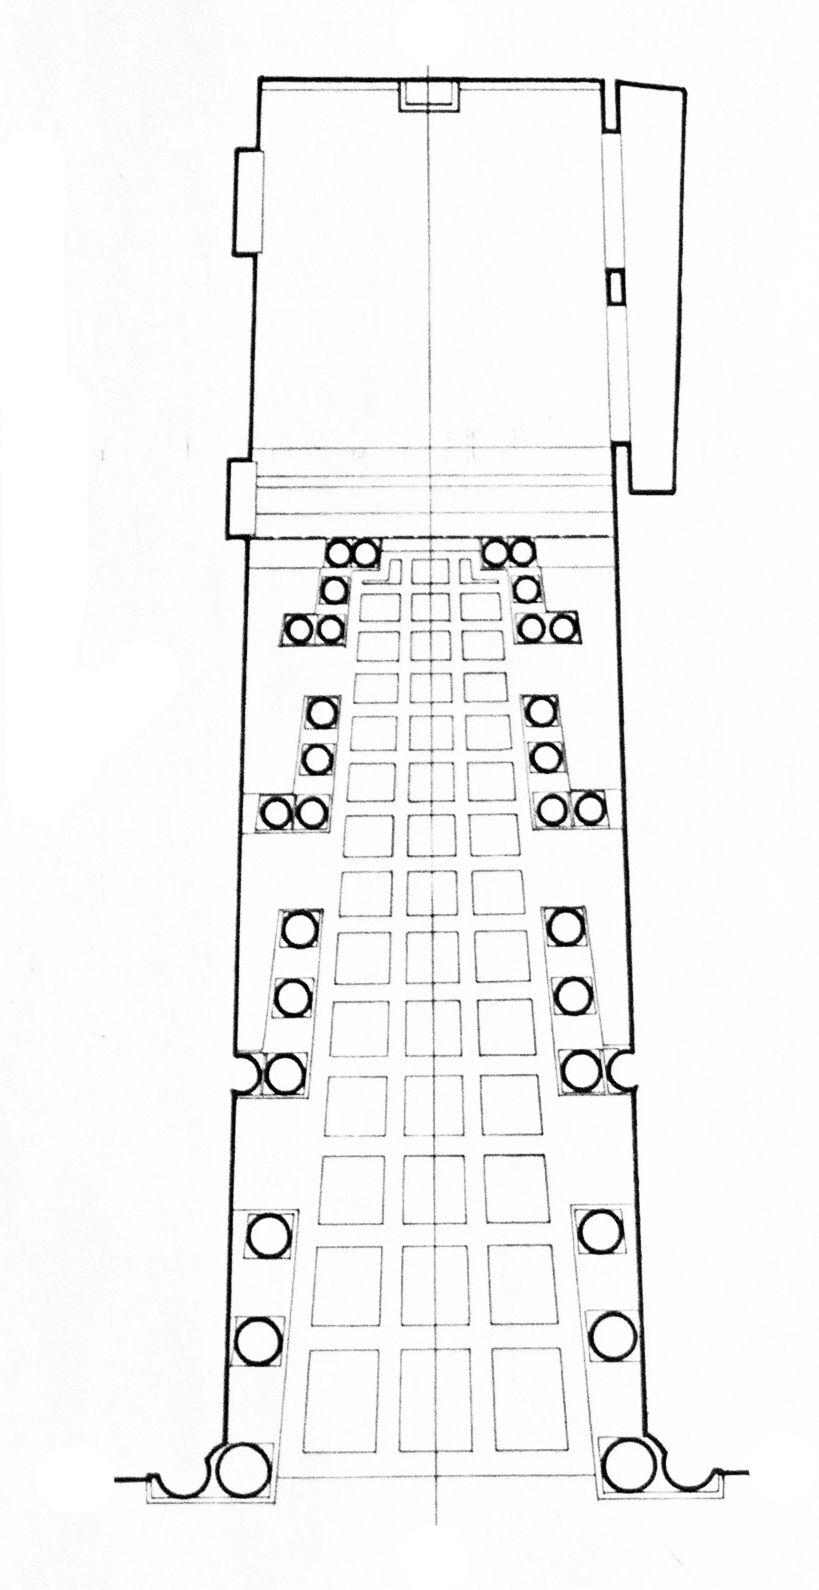 Borromini - Palazzo Spada, Rome, plan. False perspective